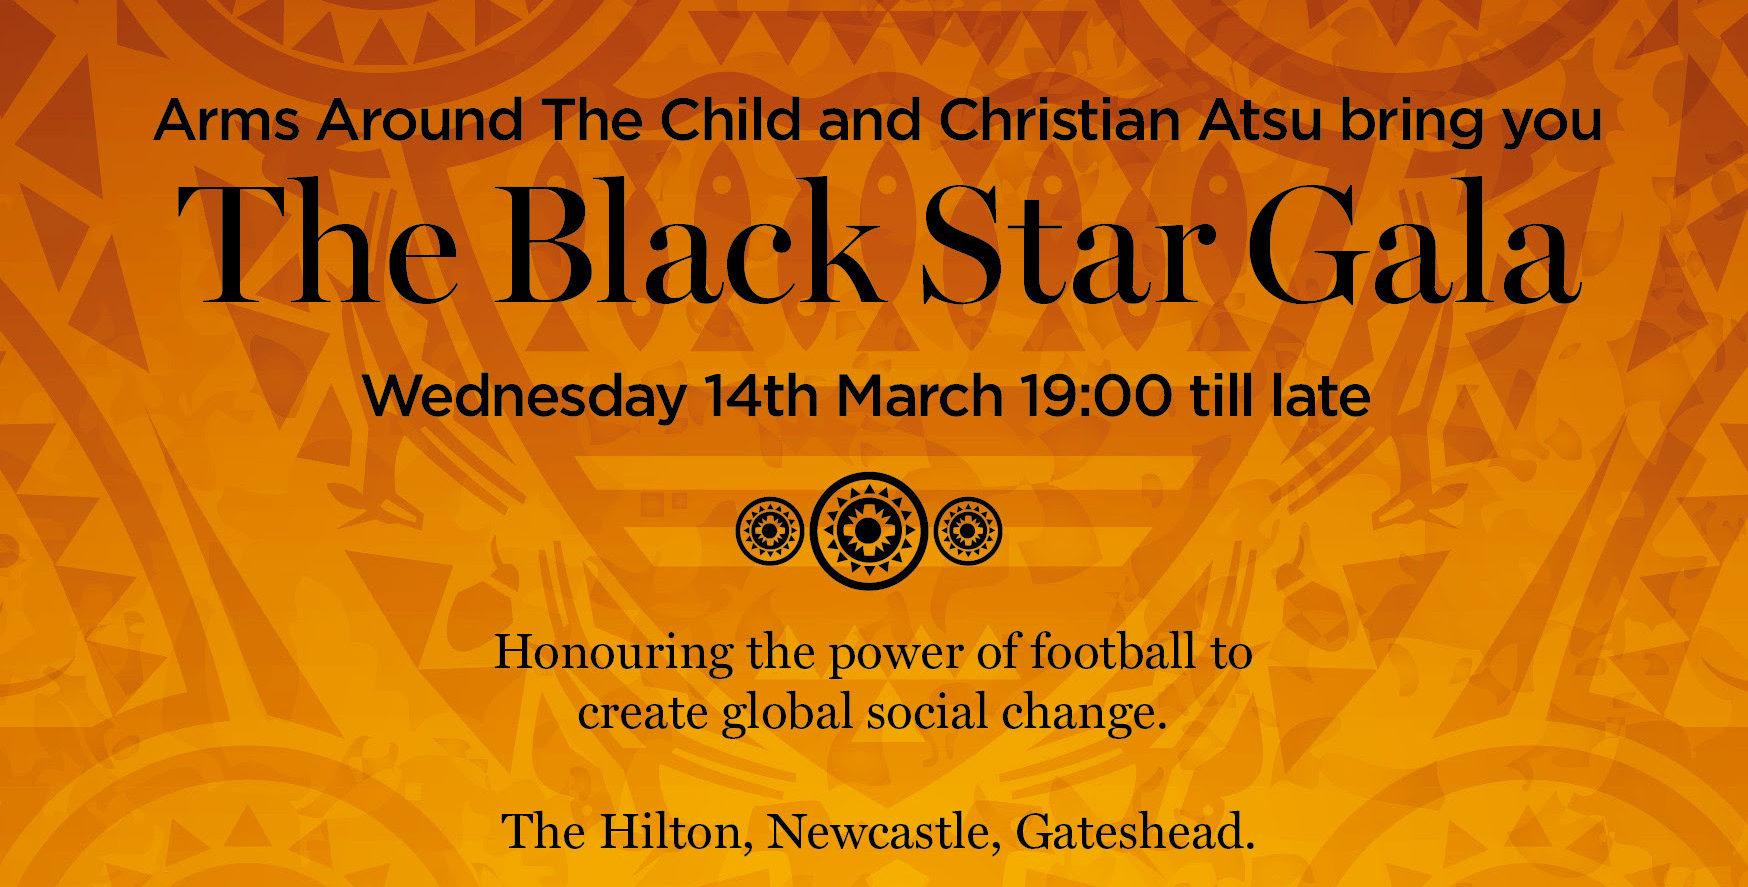 Black Star Gala, Atsu